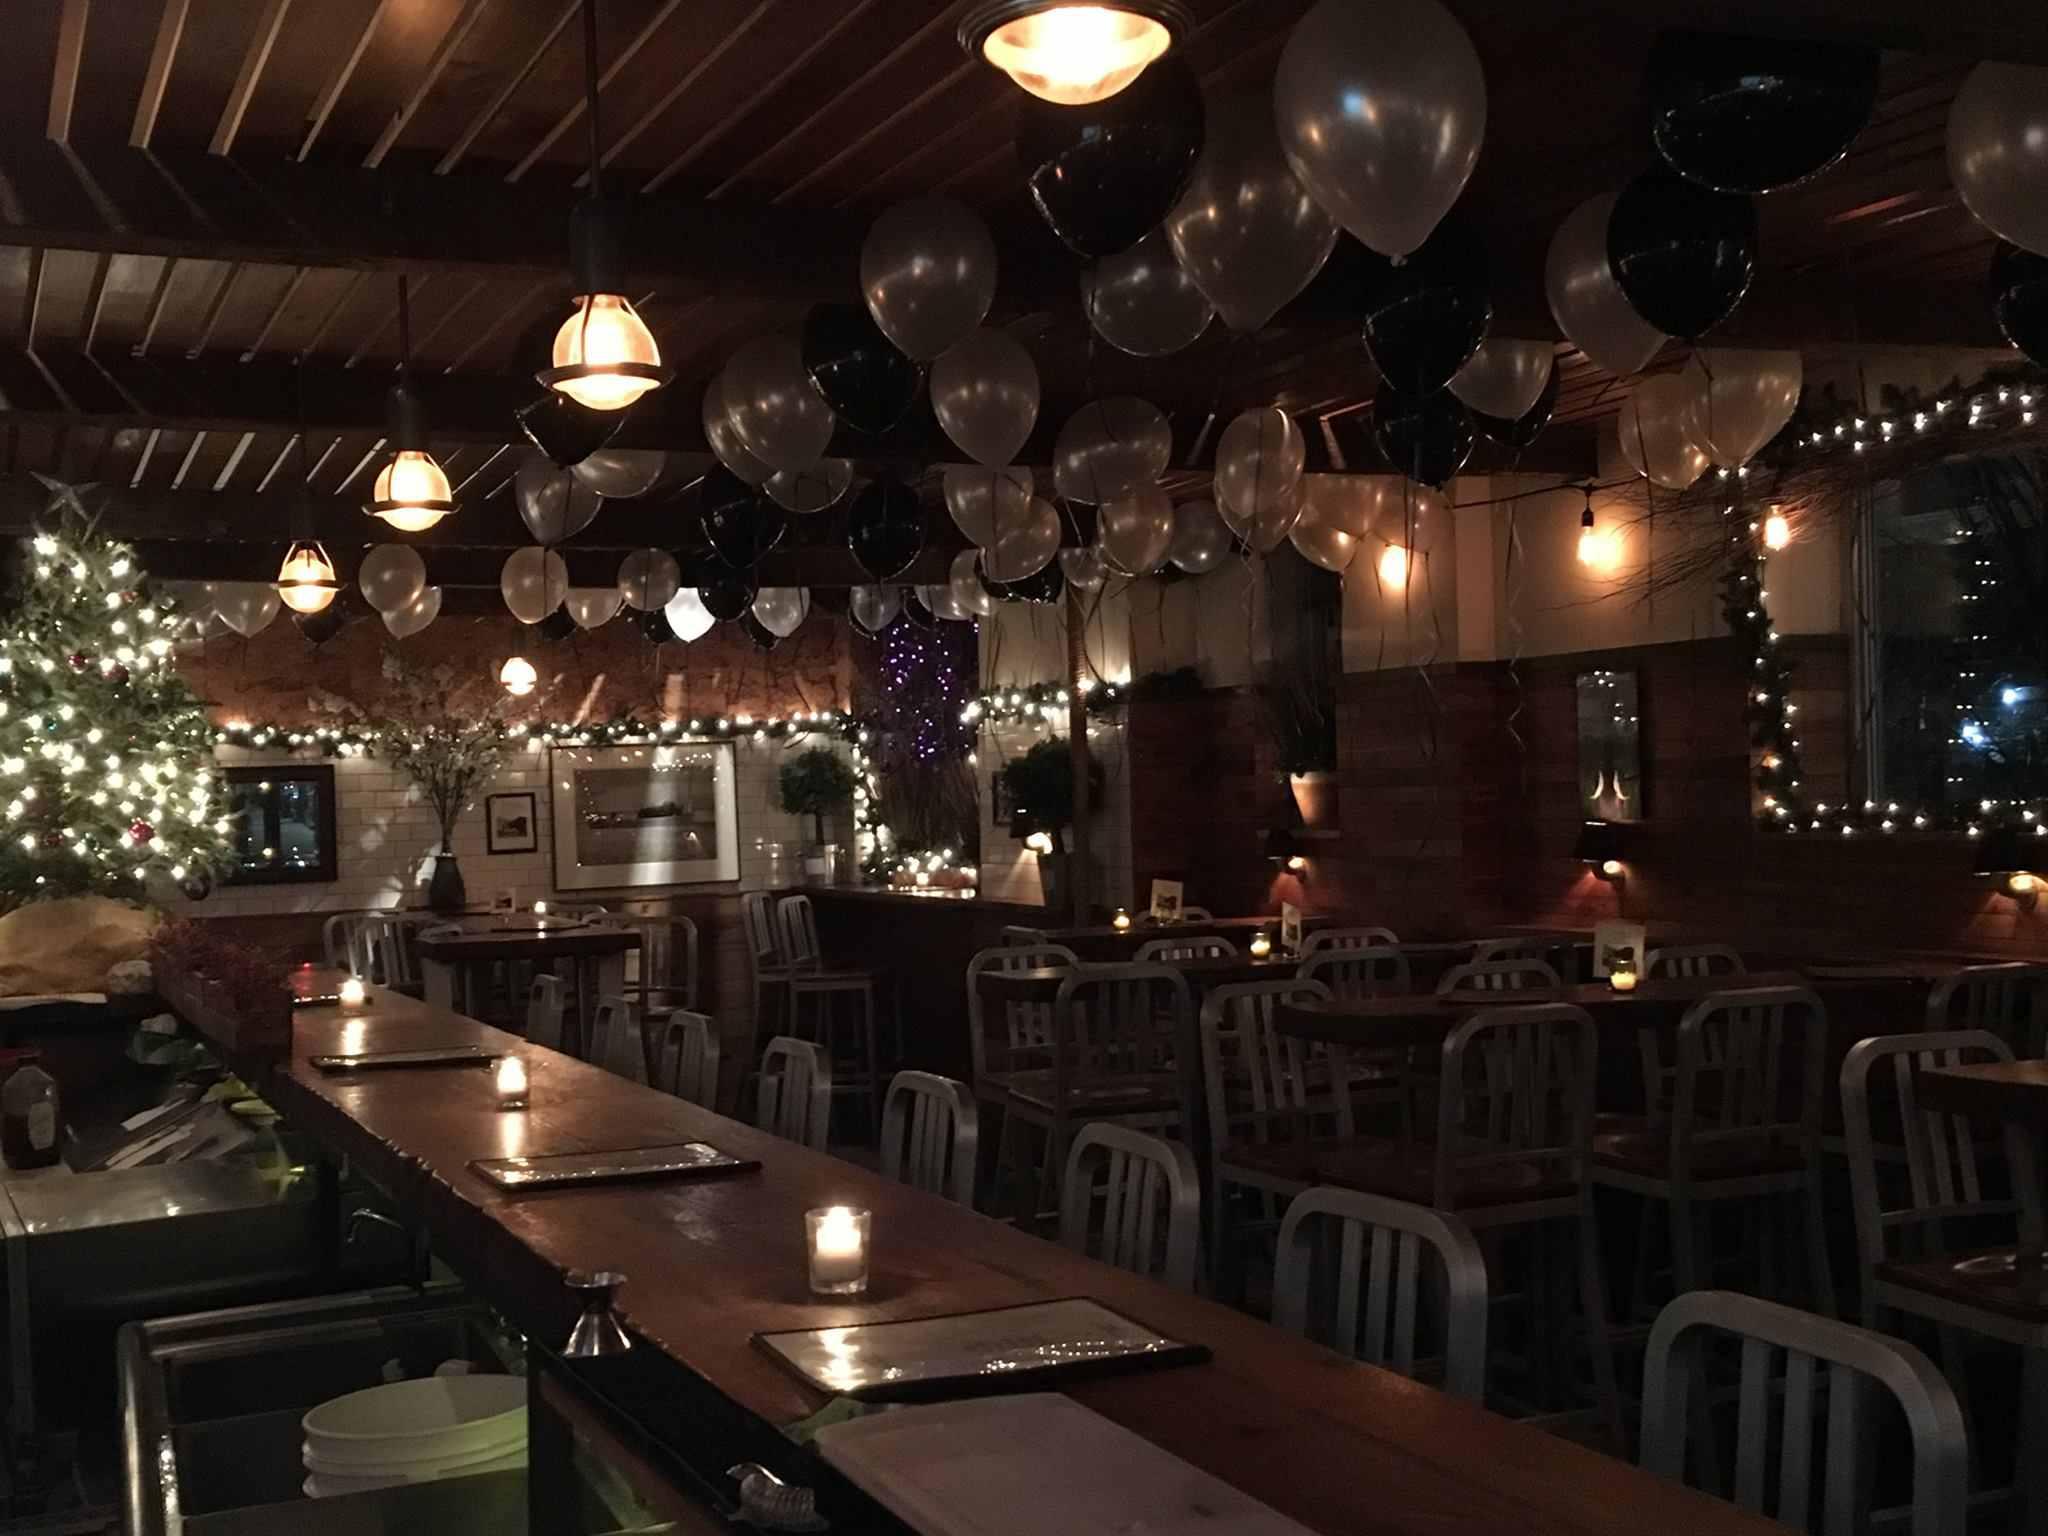 New Year's Eve at Woodhul Wine Bar